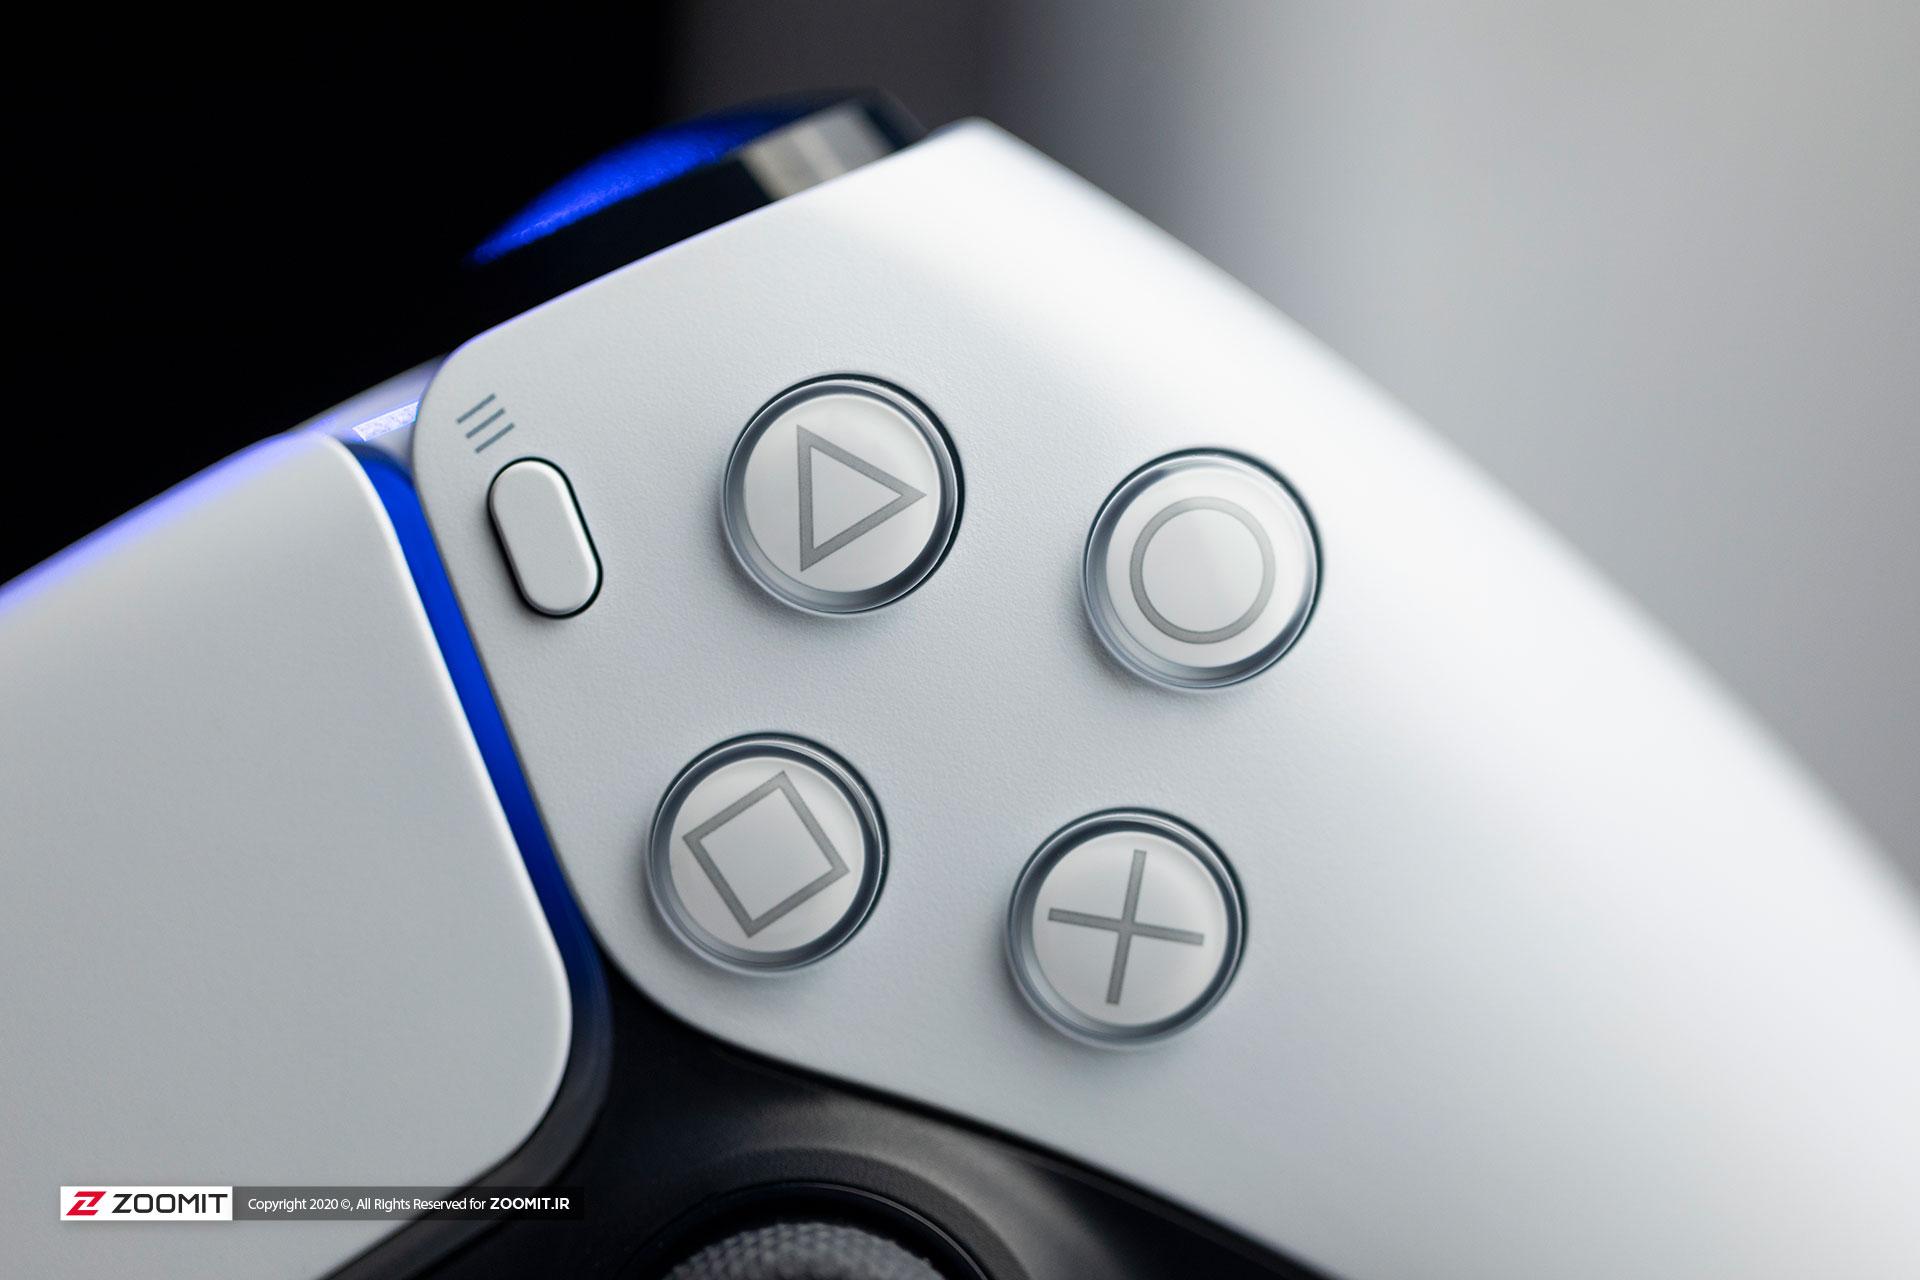 PlayStation 5 PS5 handle design